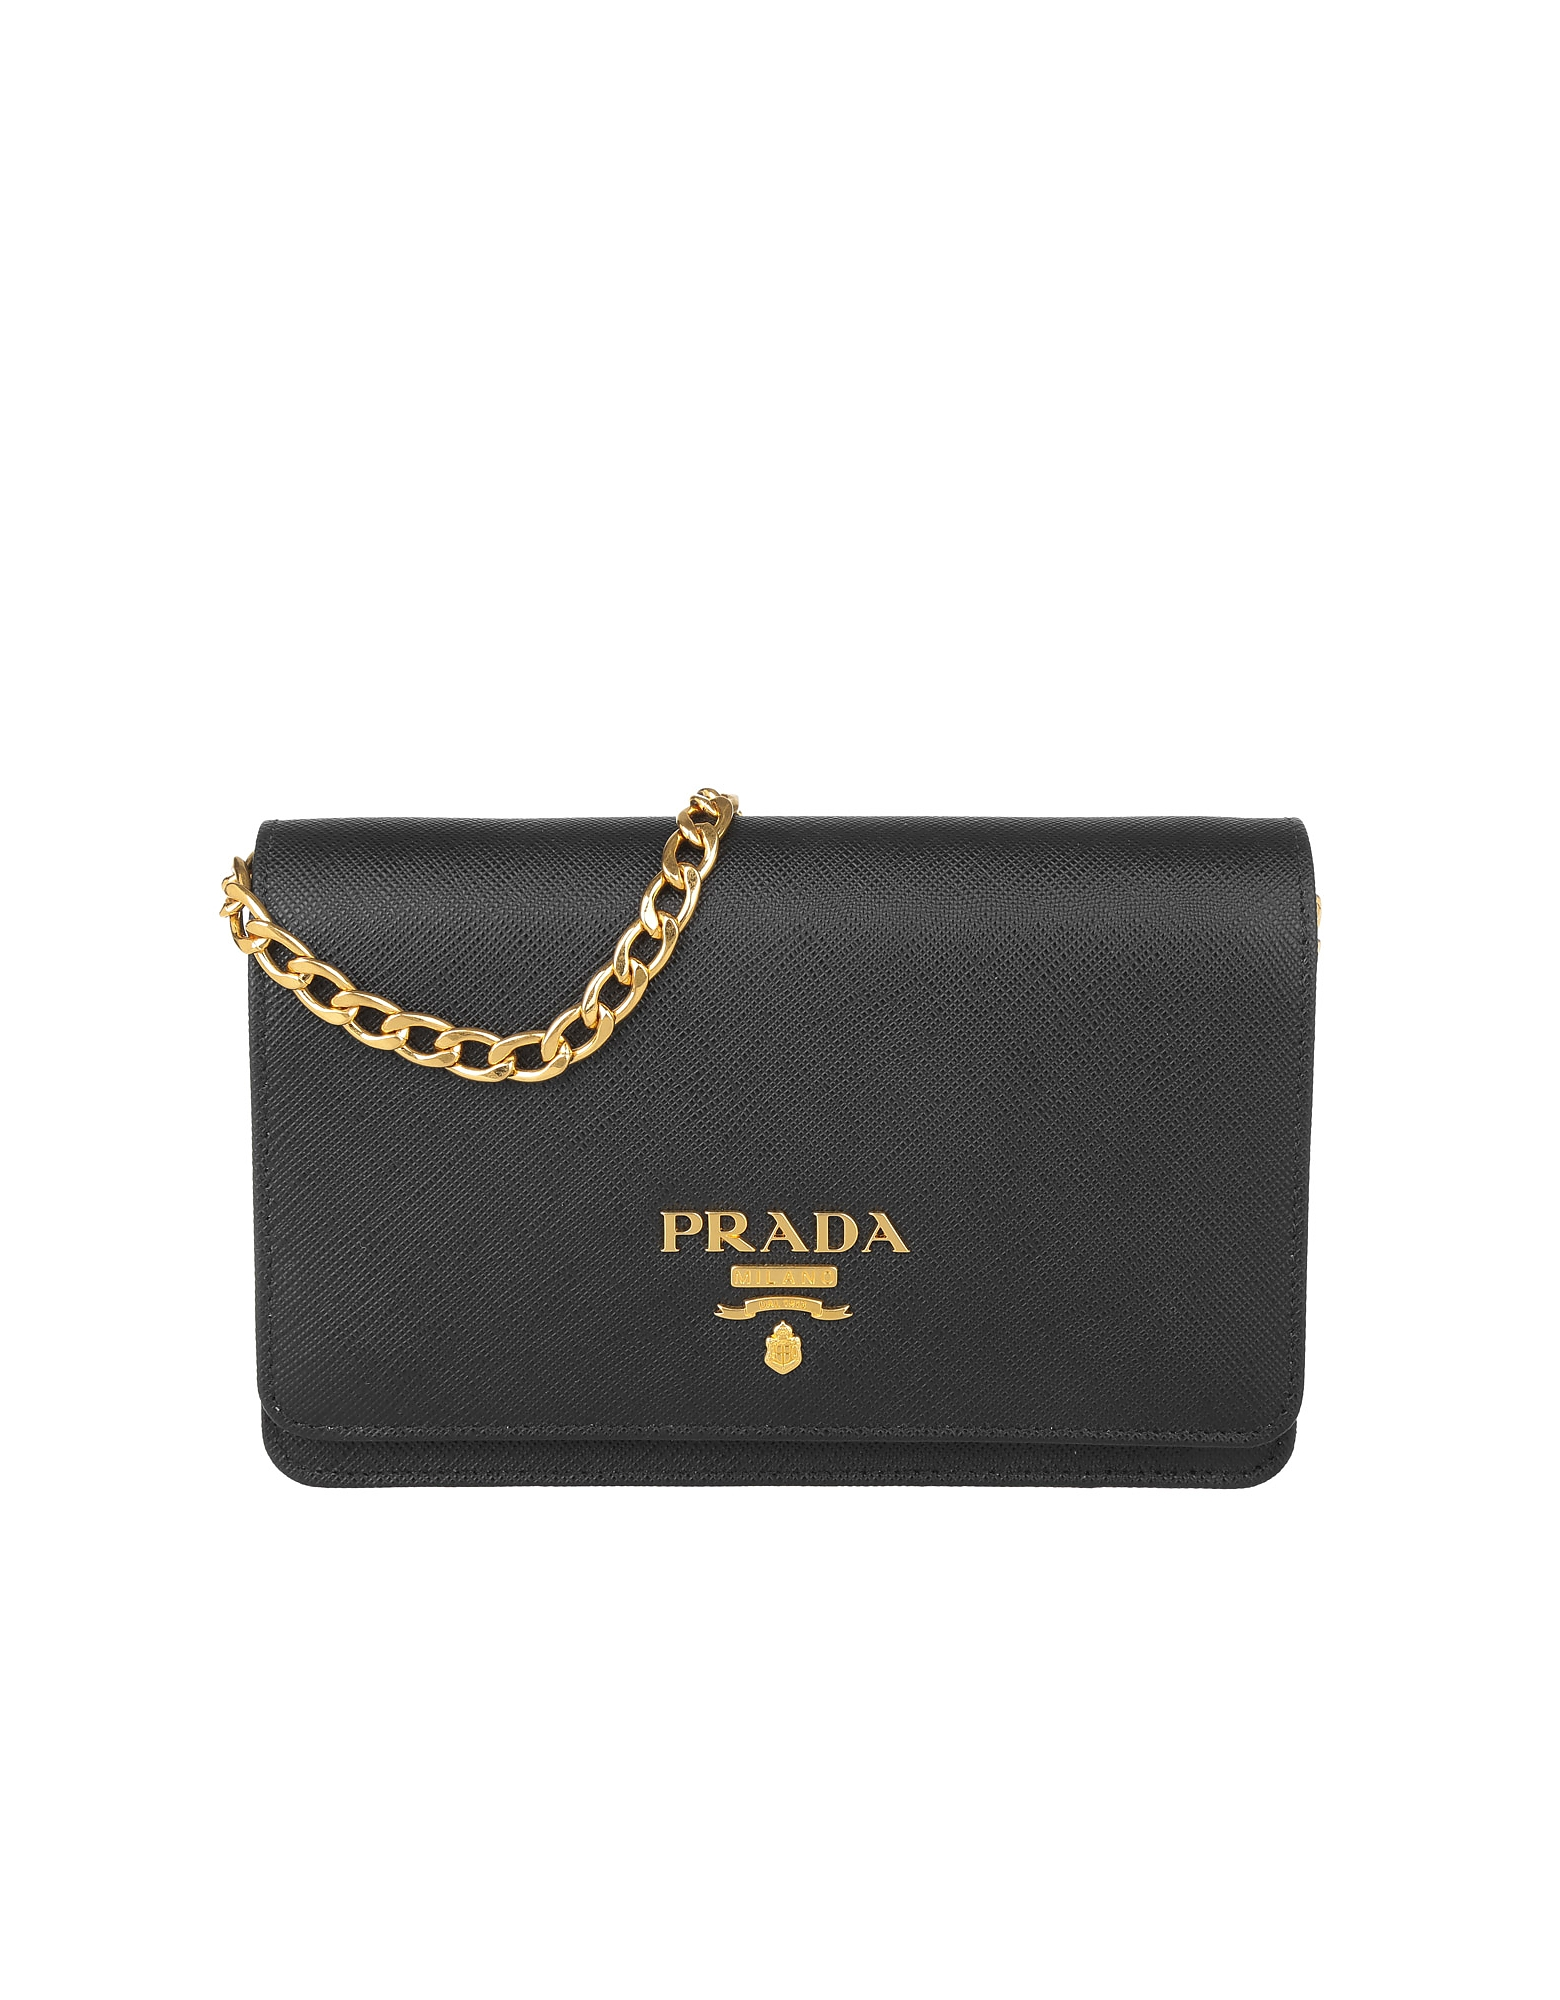 80f17347d78f Prada Designer Handbags, Shoulder Bag Saffiano Lux Nero (Luggage & Bags)  photo